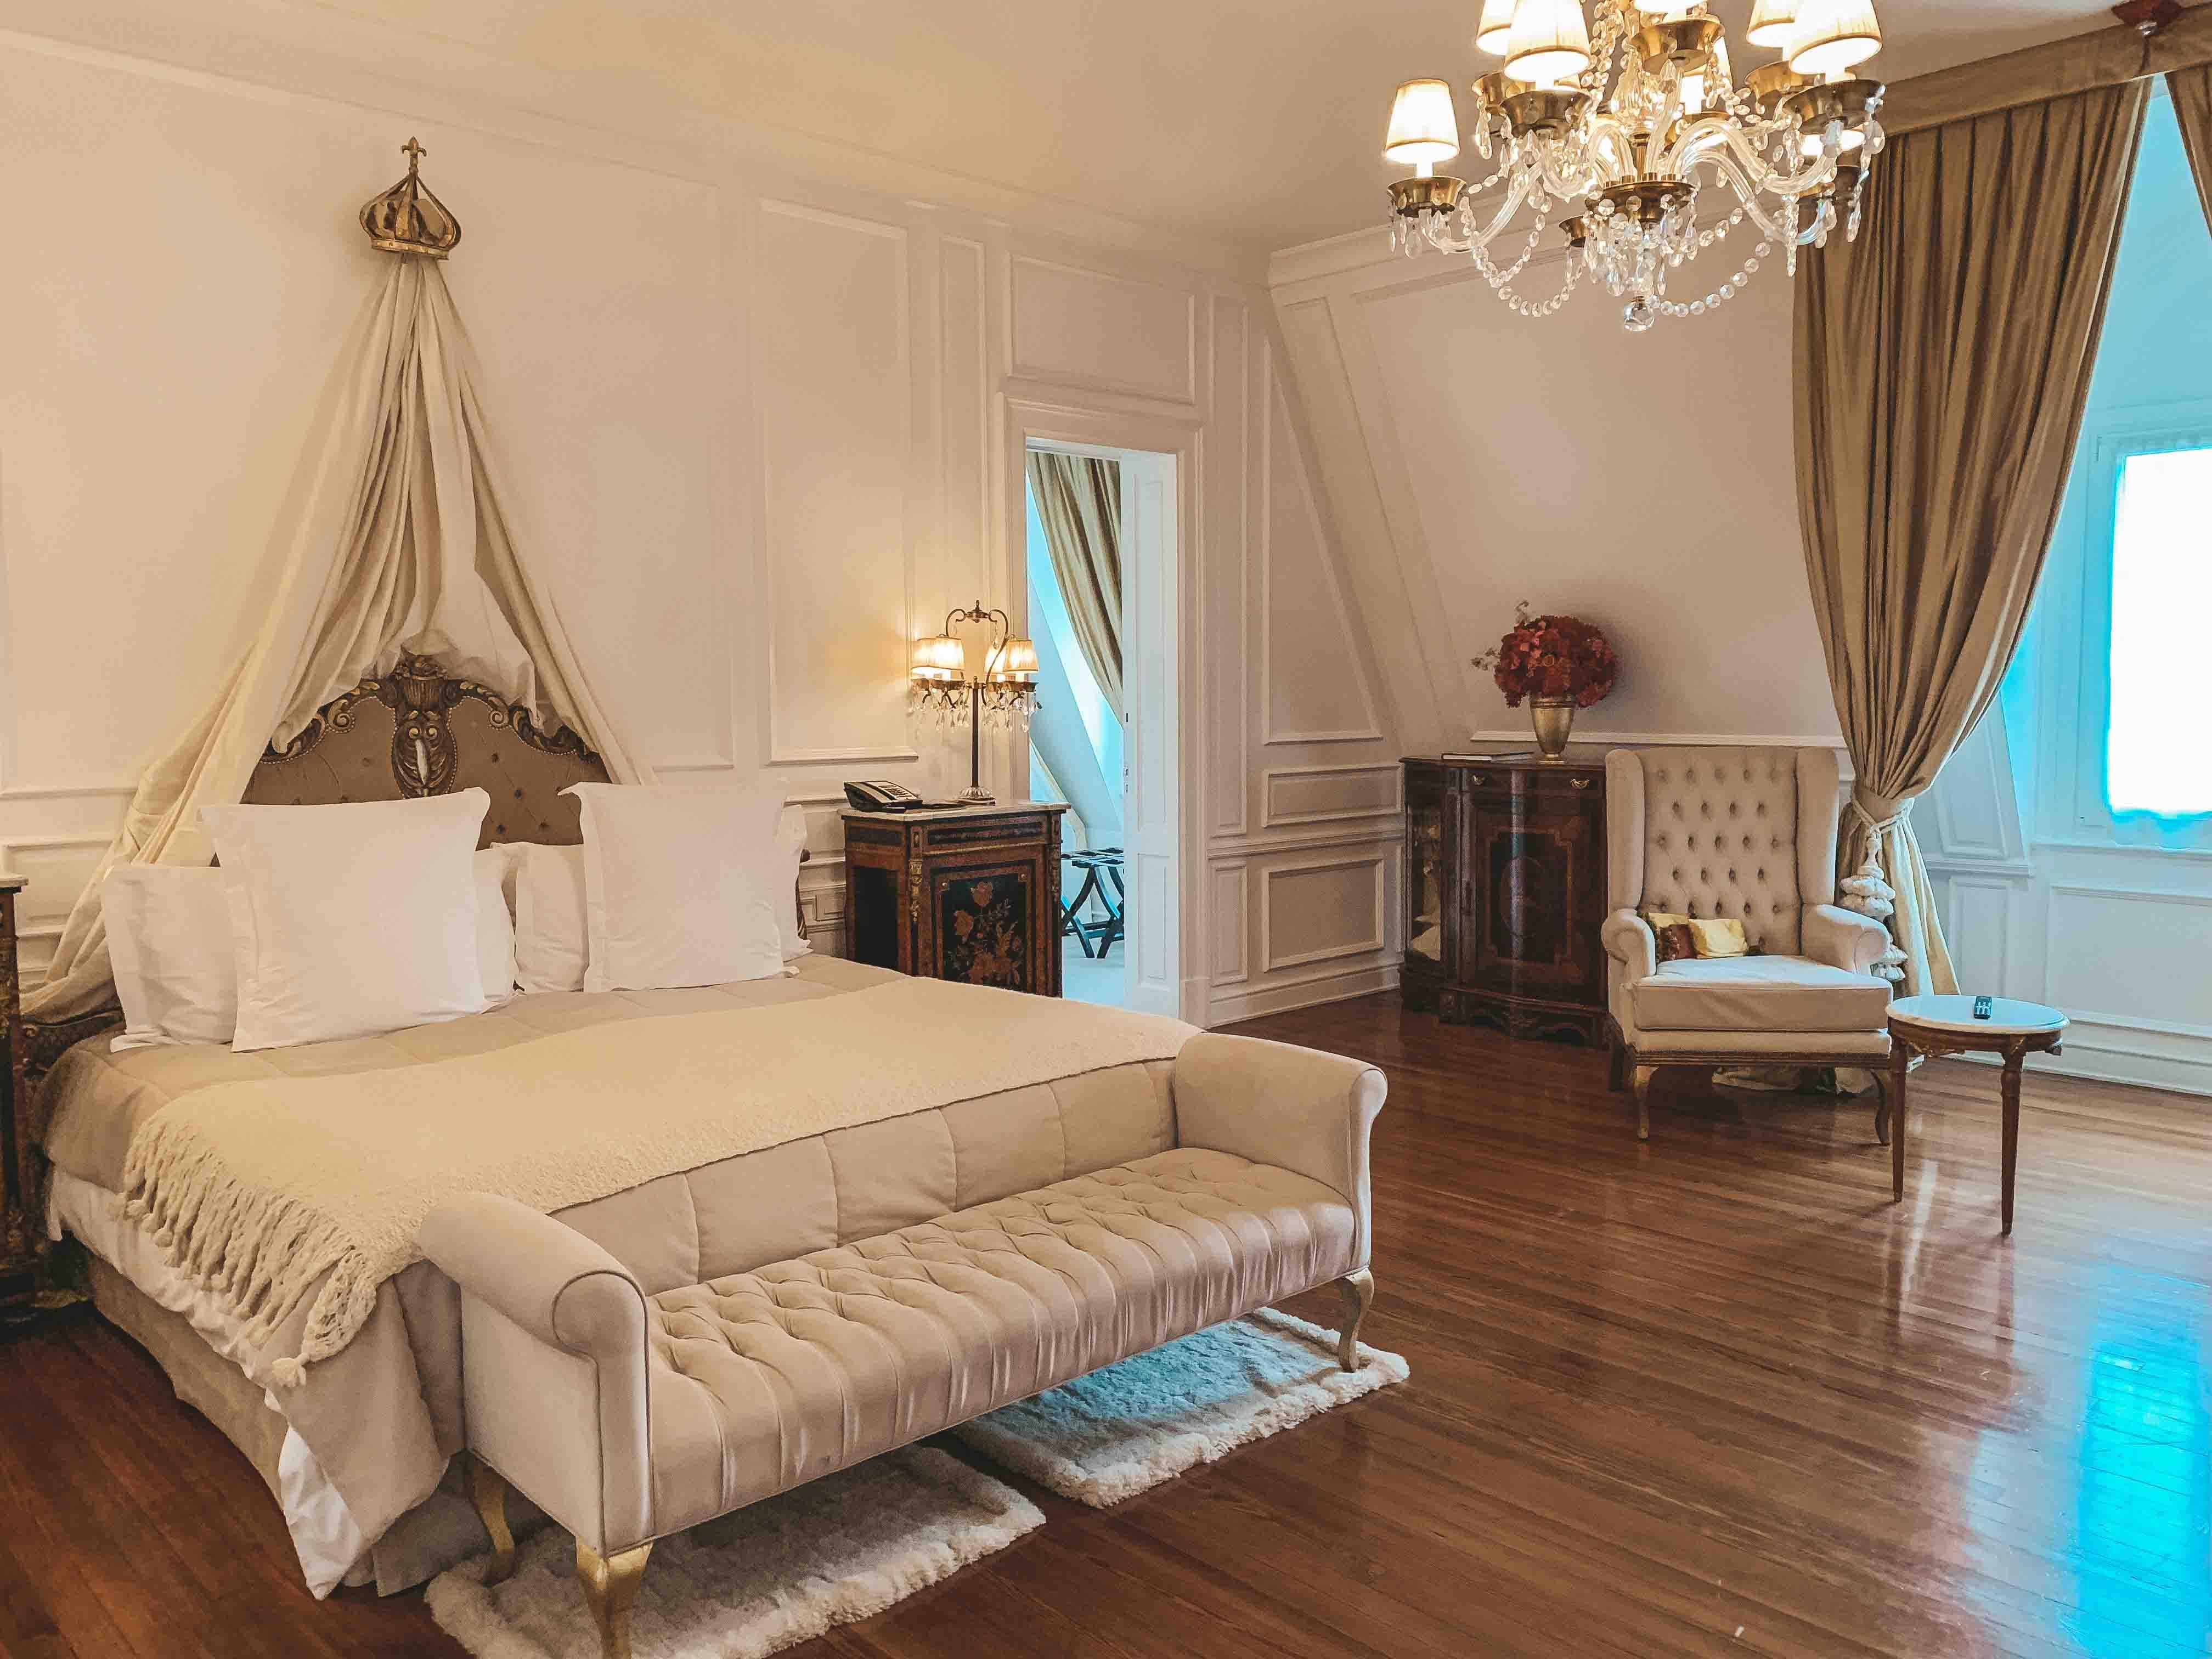 La Mansion Four Seasons Buenos Aires suite 107 Alzaga Unzue